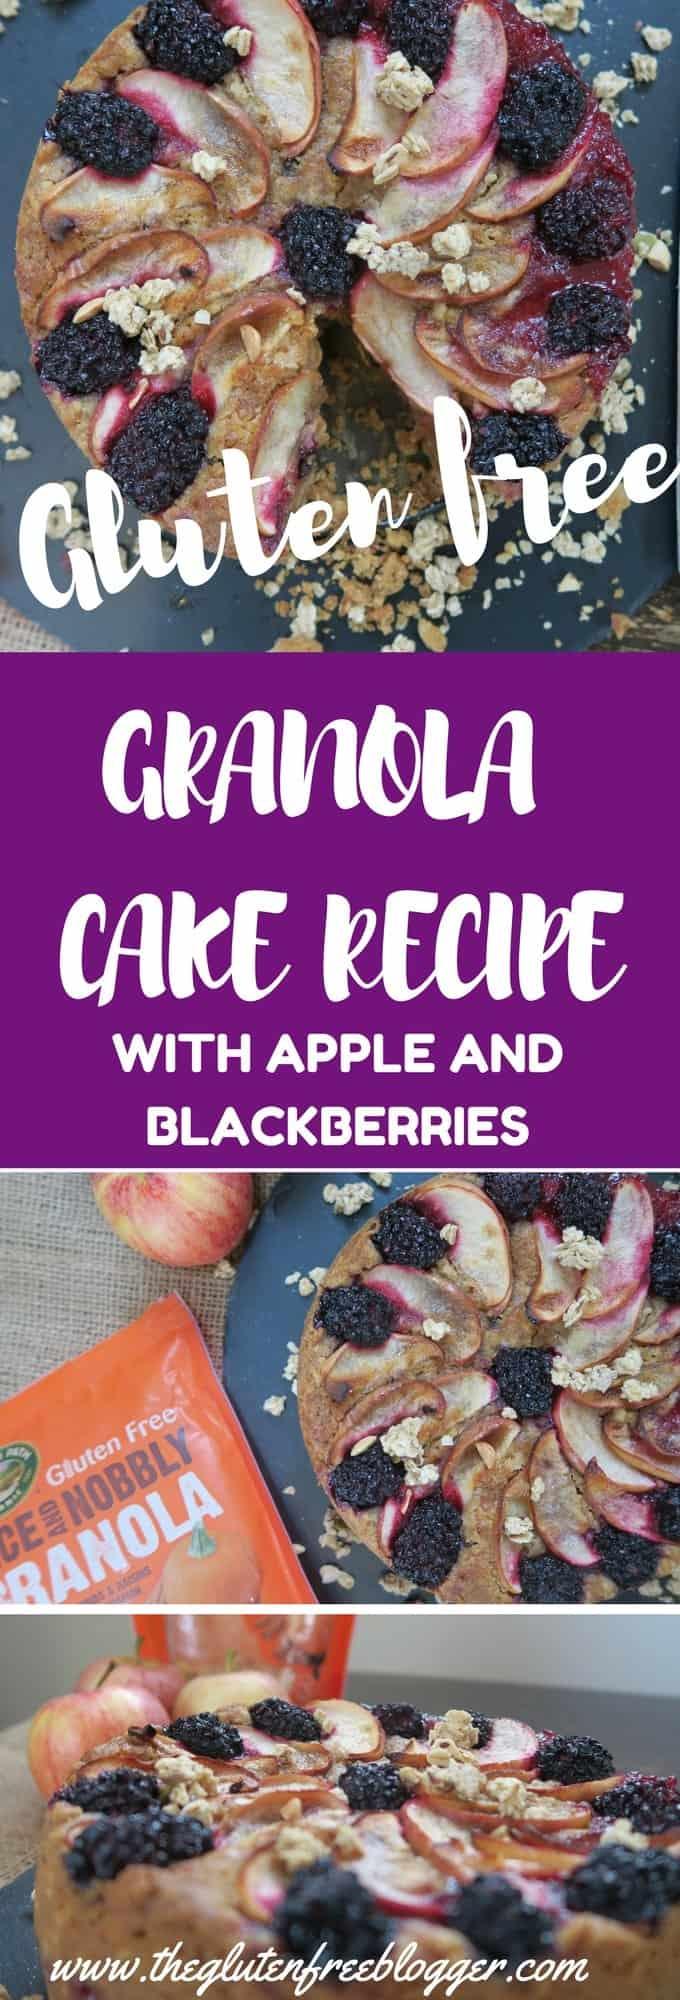 Gluten free granola cake recipe with apple and blackberries - autumn recipes - egg free - www.theglutenfreeblogger.com (1)